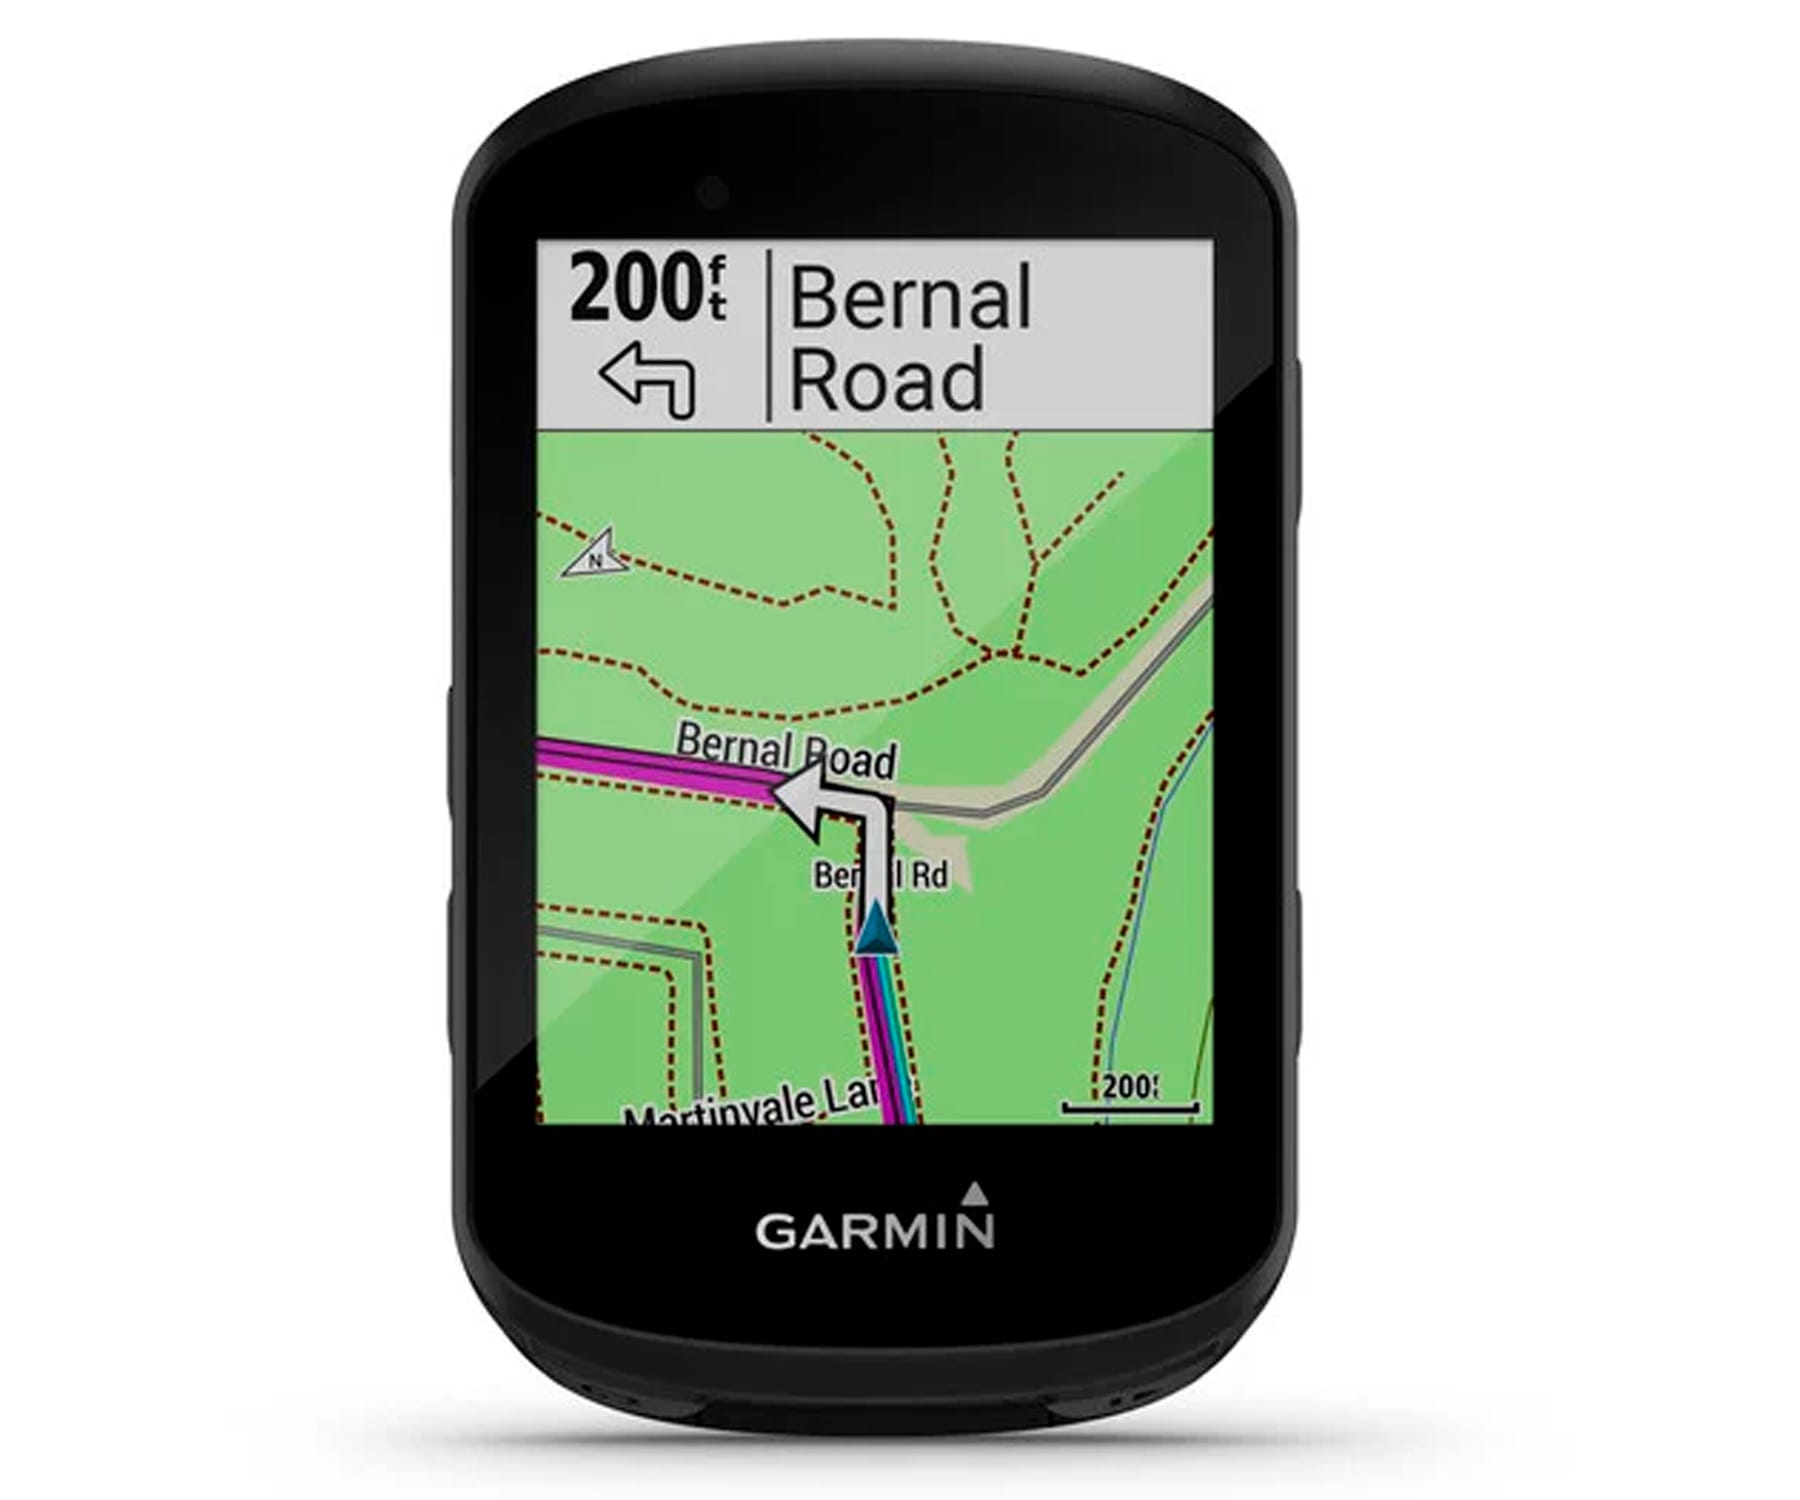 GARMIN EDGE 530 CICLOCOMPUTADOR 2.6'' PARA BICI GPS GLONASS GALILEO ALTÍMETRO BAROMÉTRICO ACELEROMETRO